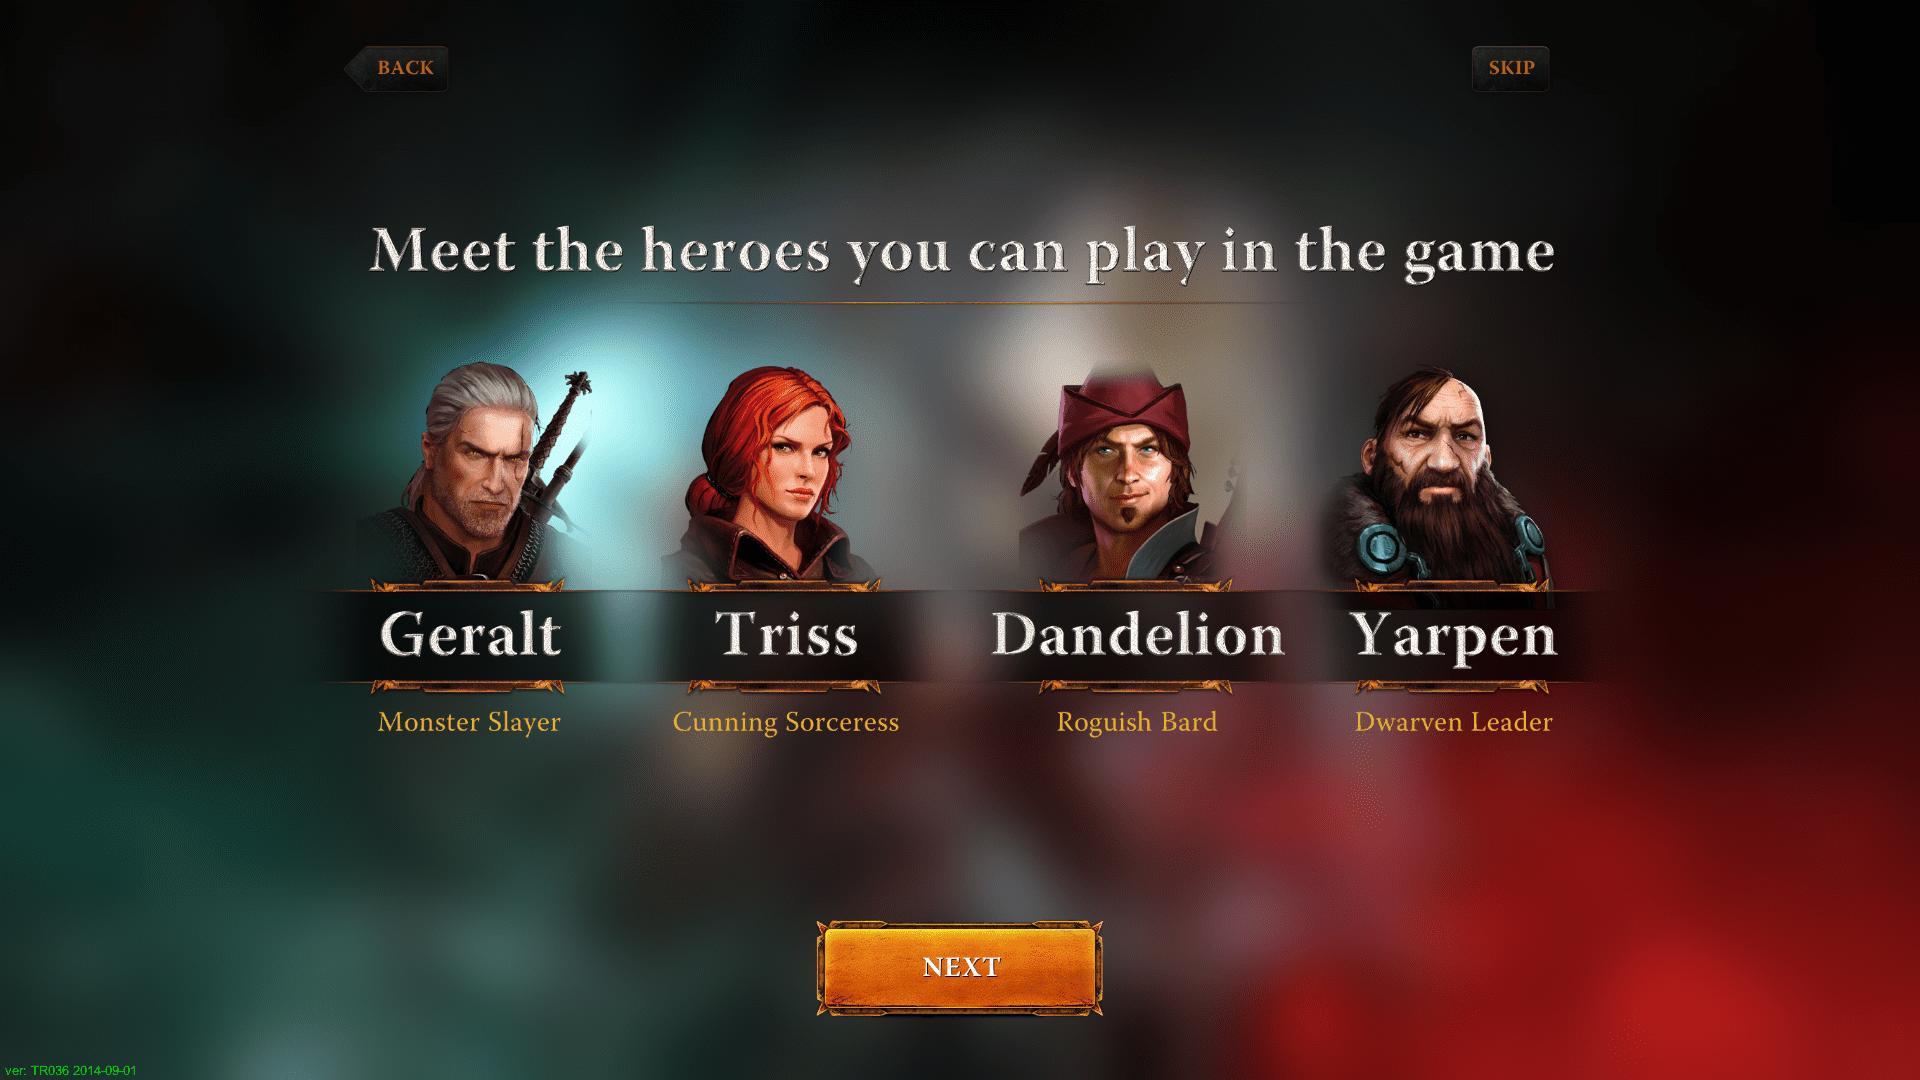 Die vier Helden